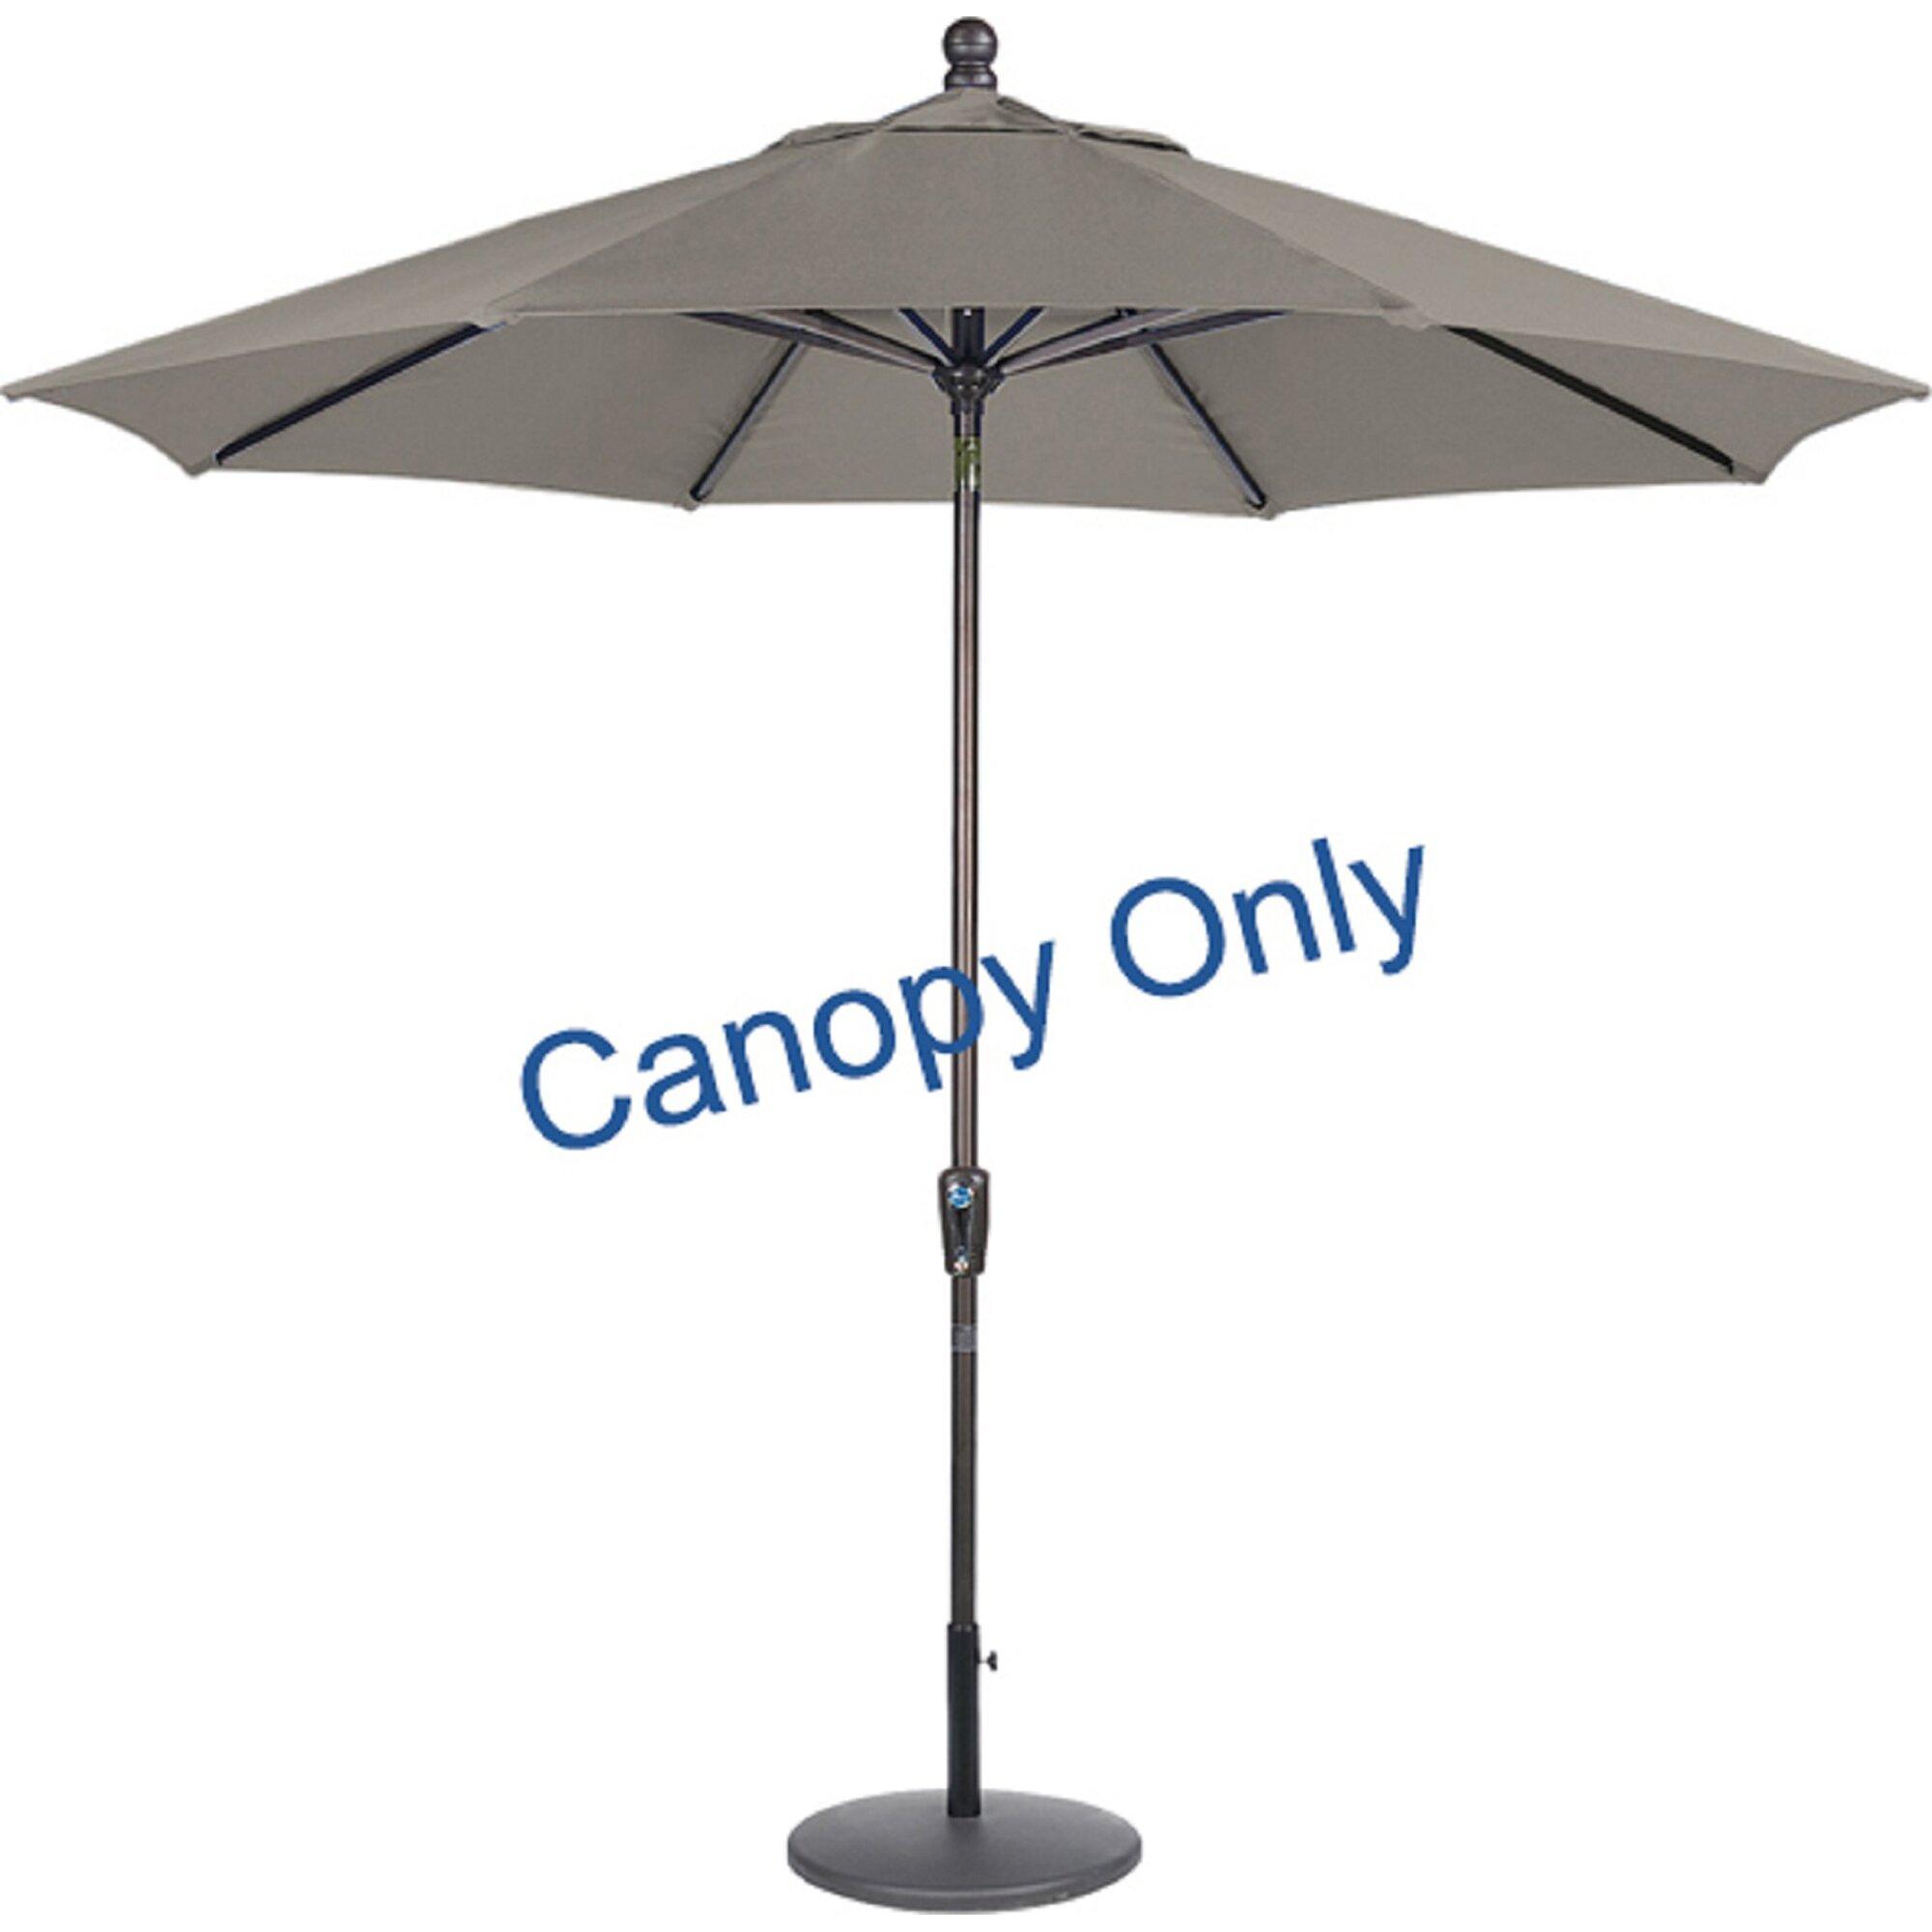 amauri outdoor living inc 9 39 sunbrella replacement canopy for market umbrella reviews wayfair. Black Bedroom Furniture Sets. Home Design Ideas